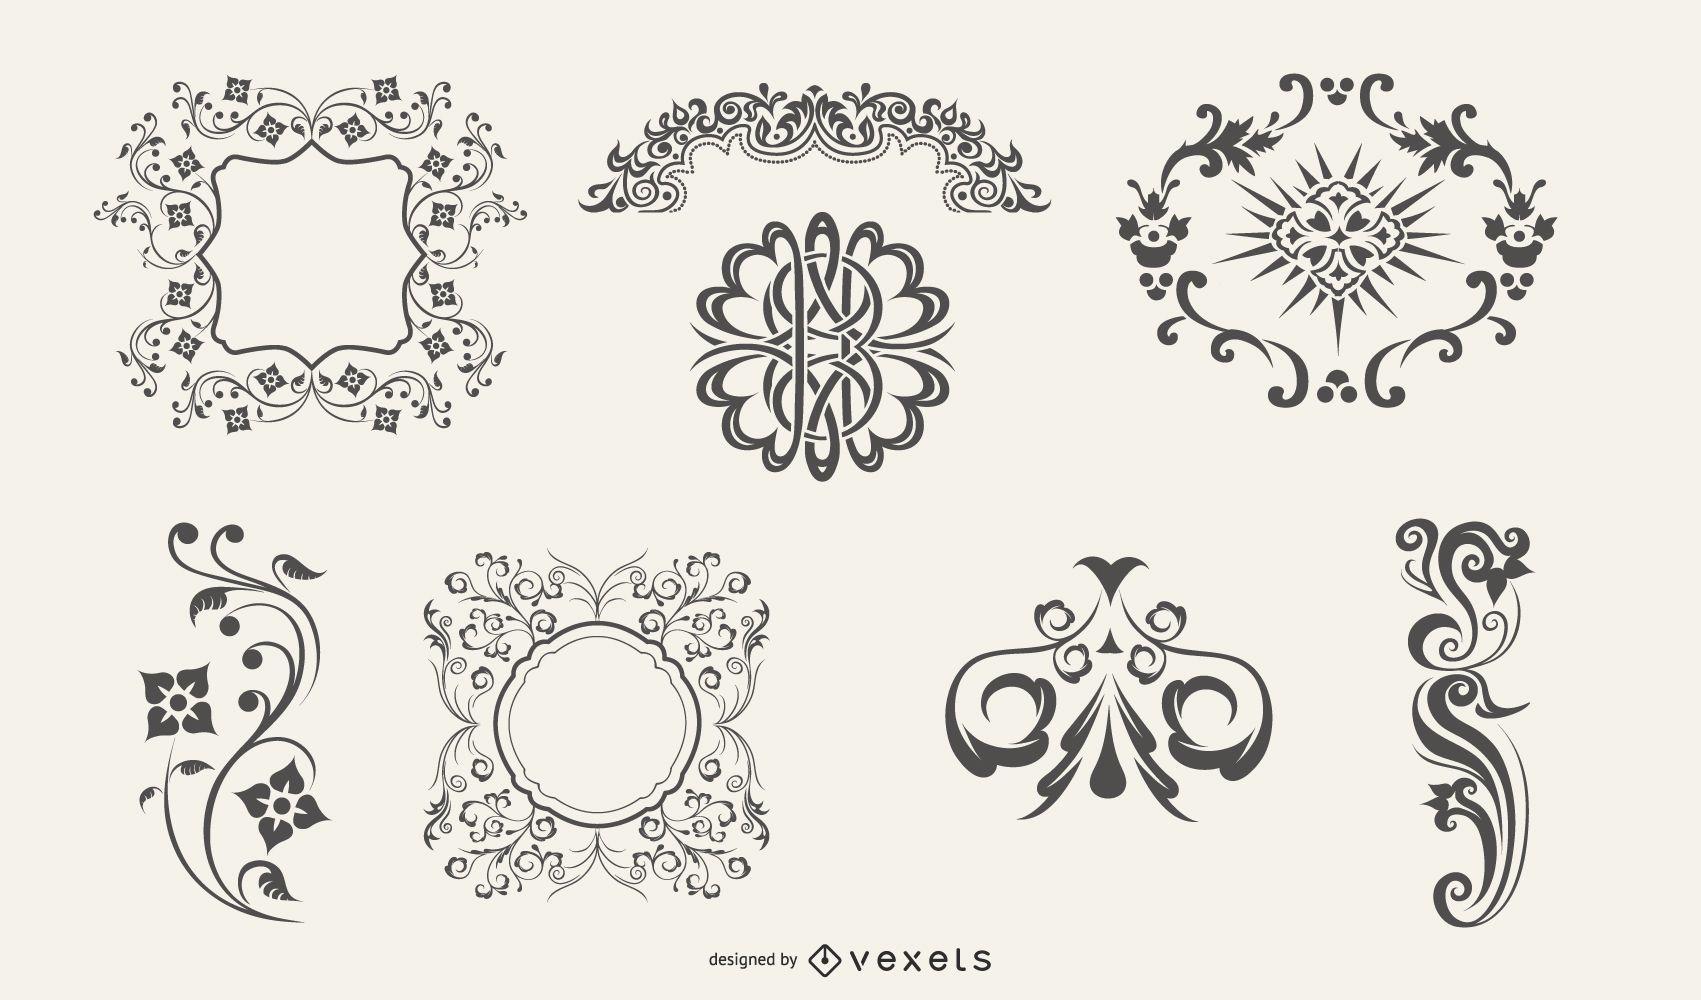 Flourish Swirl Ornament Pack